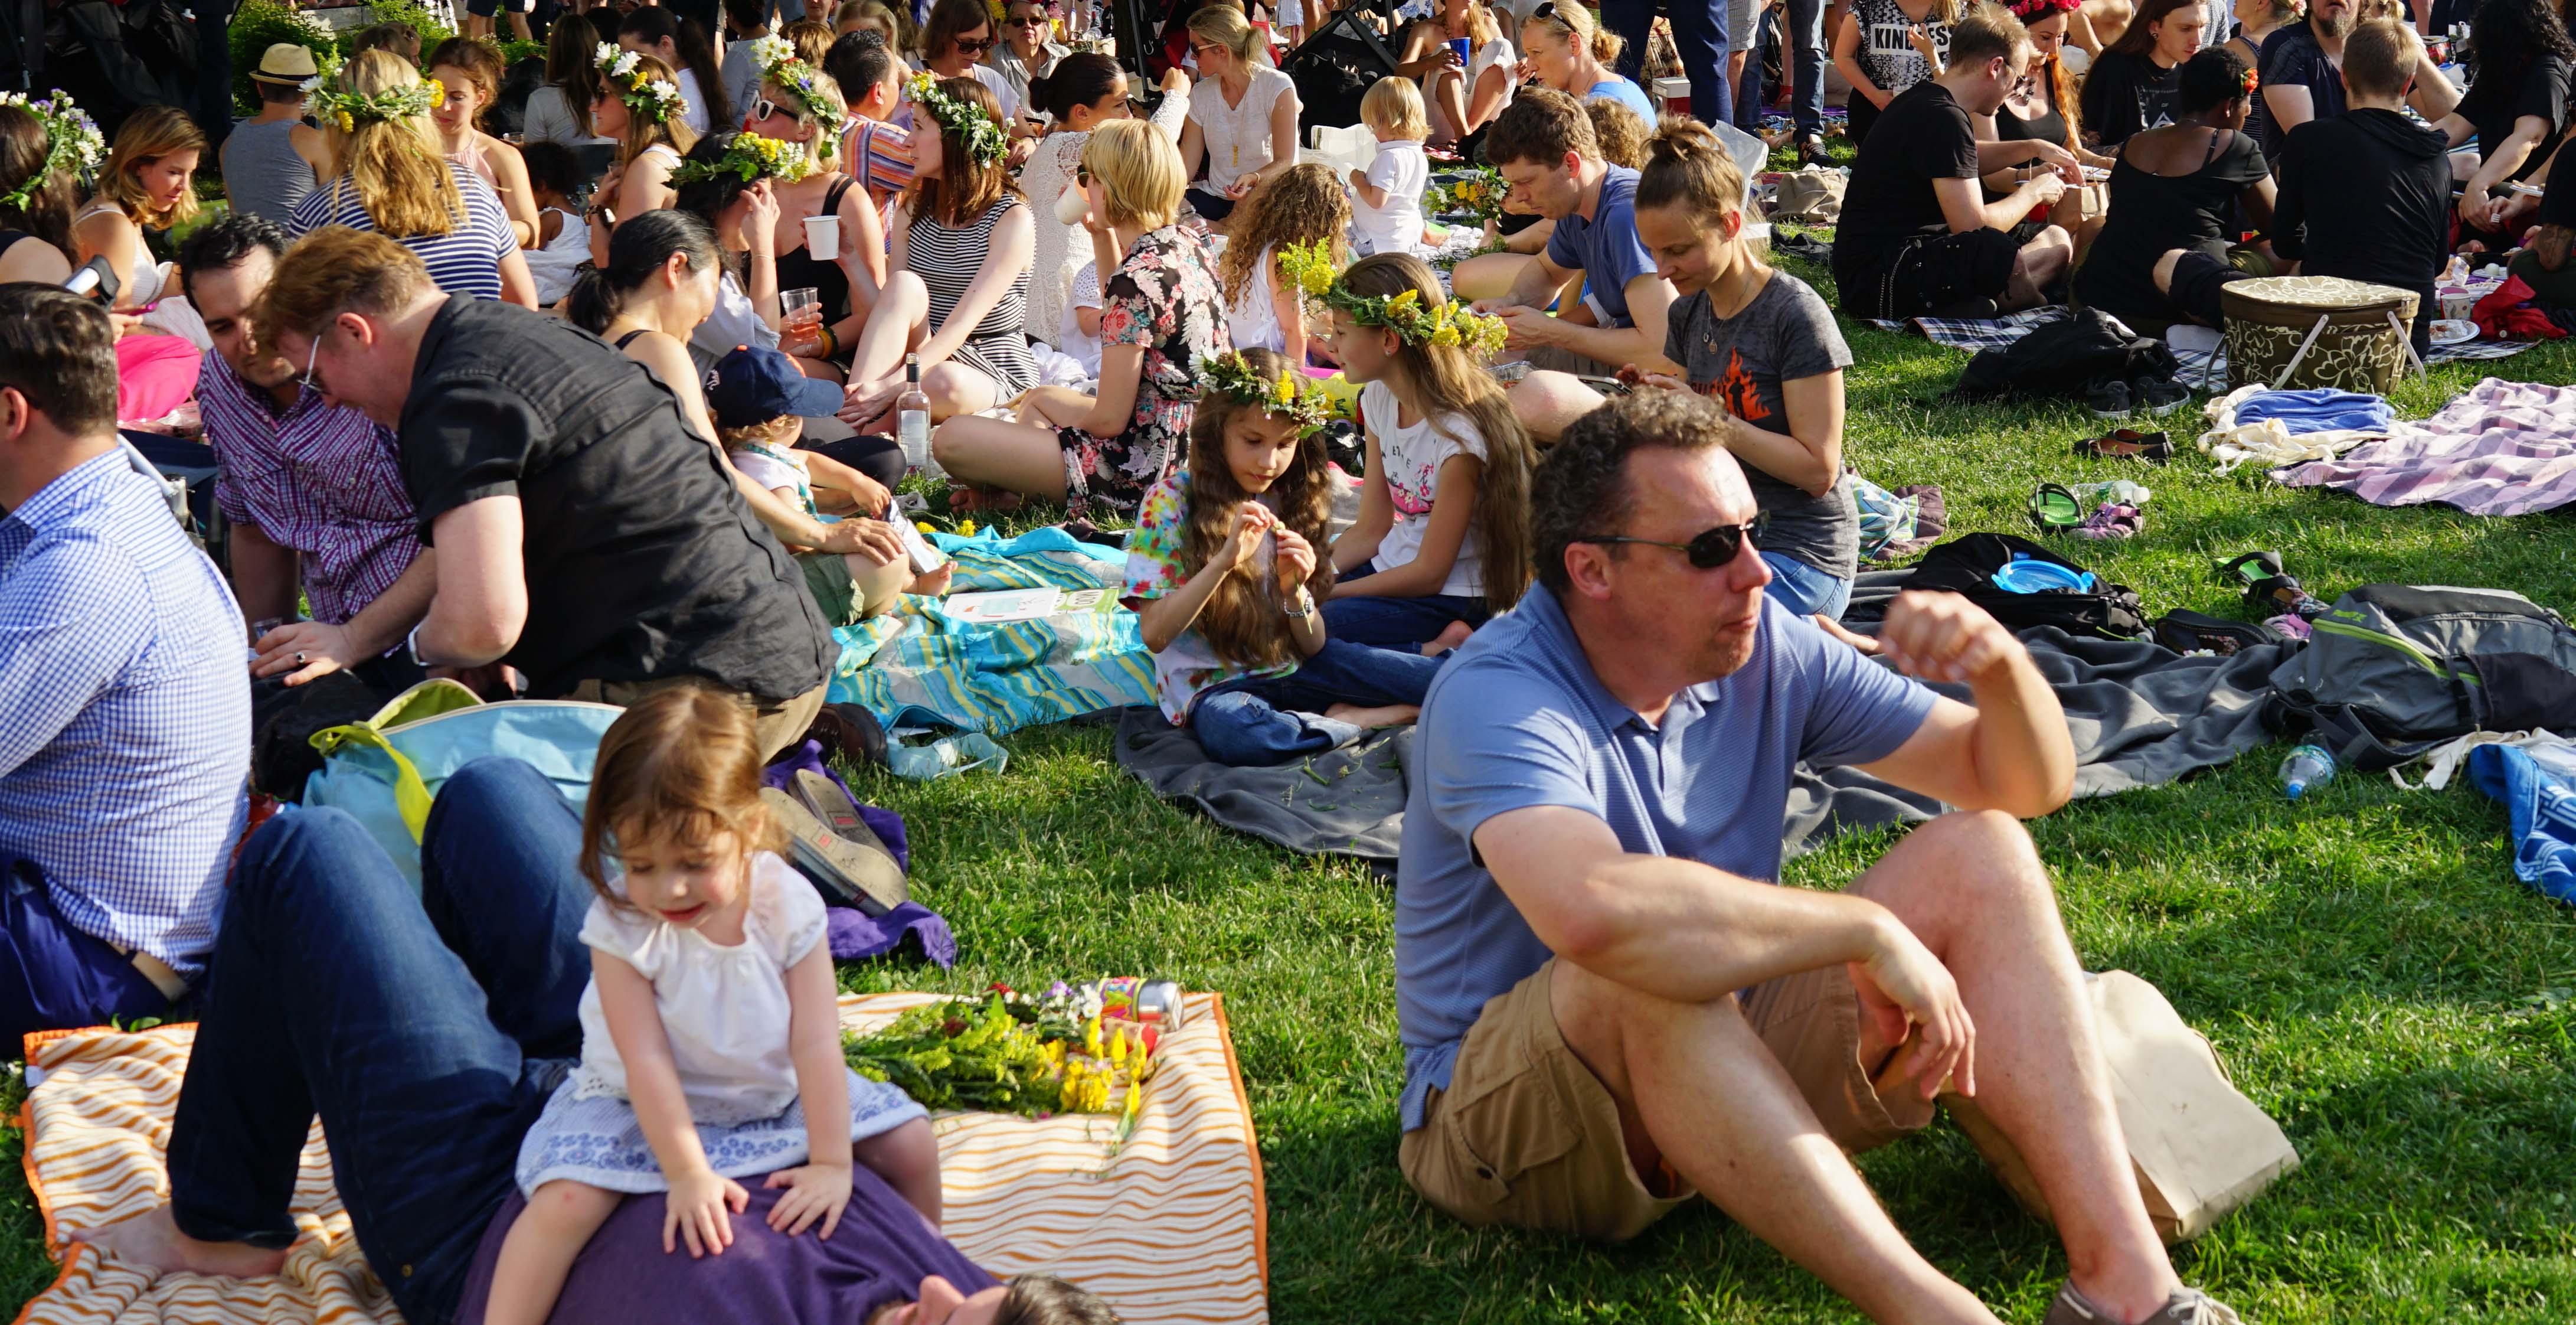 Swedish festival picnic 2